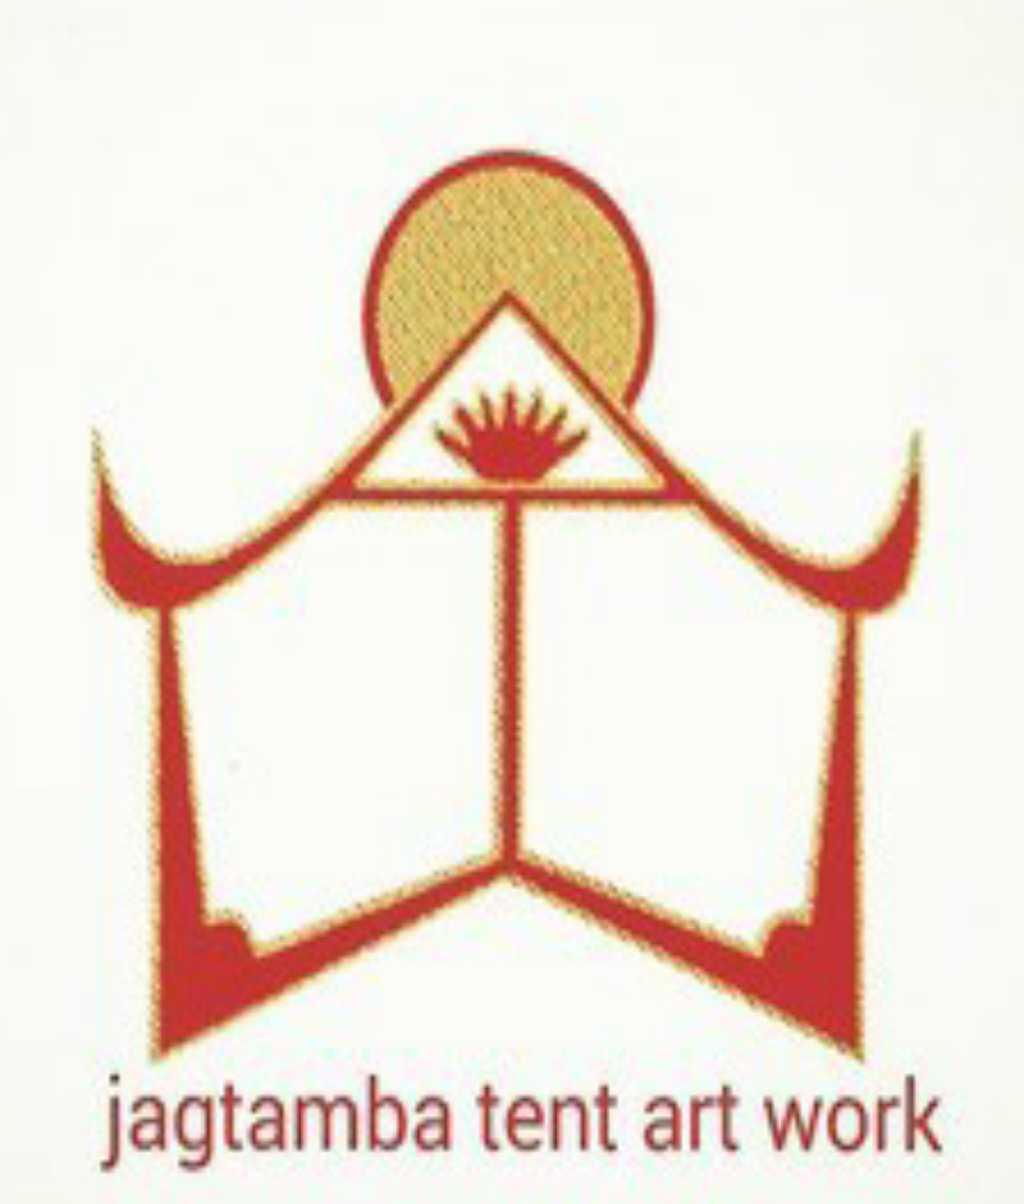 JAGTAMBA TENT ART WORKS